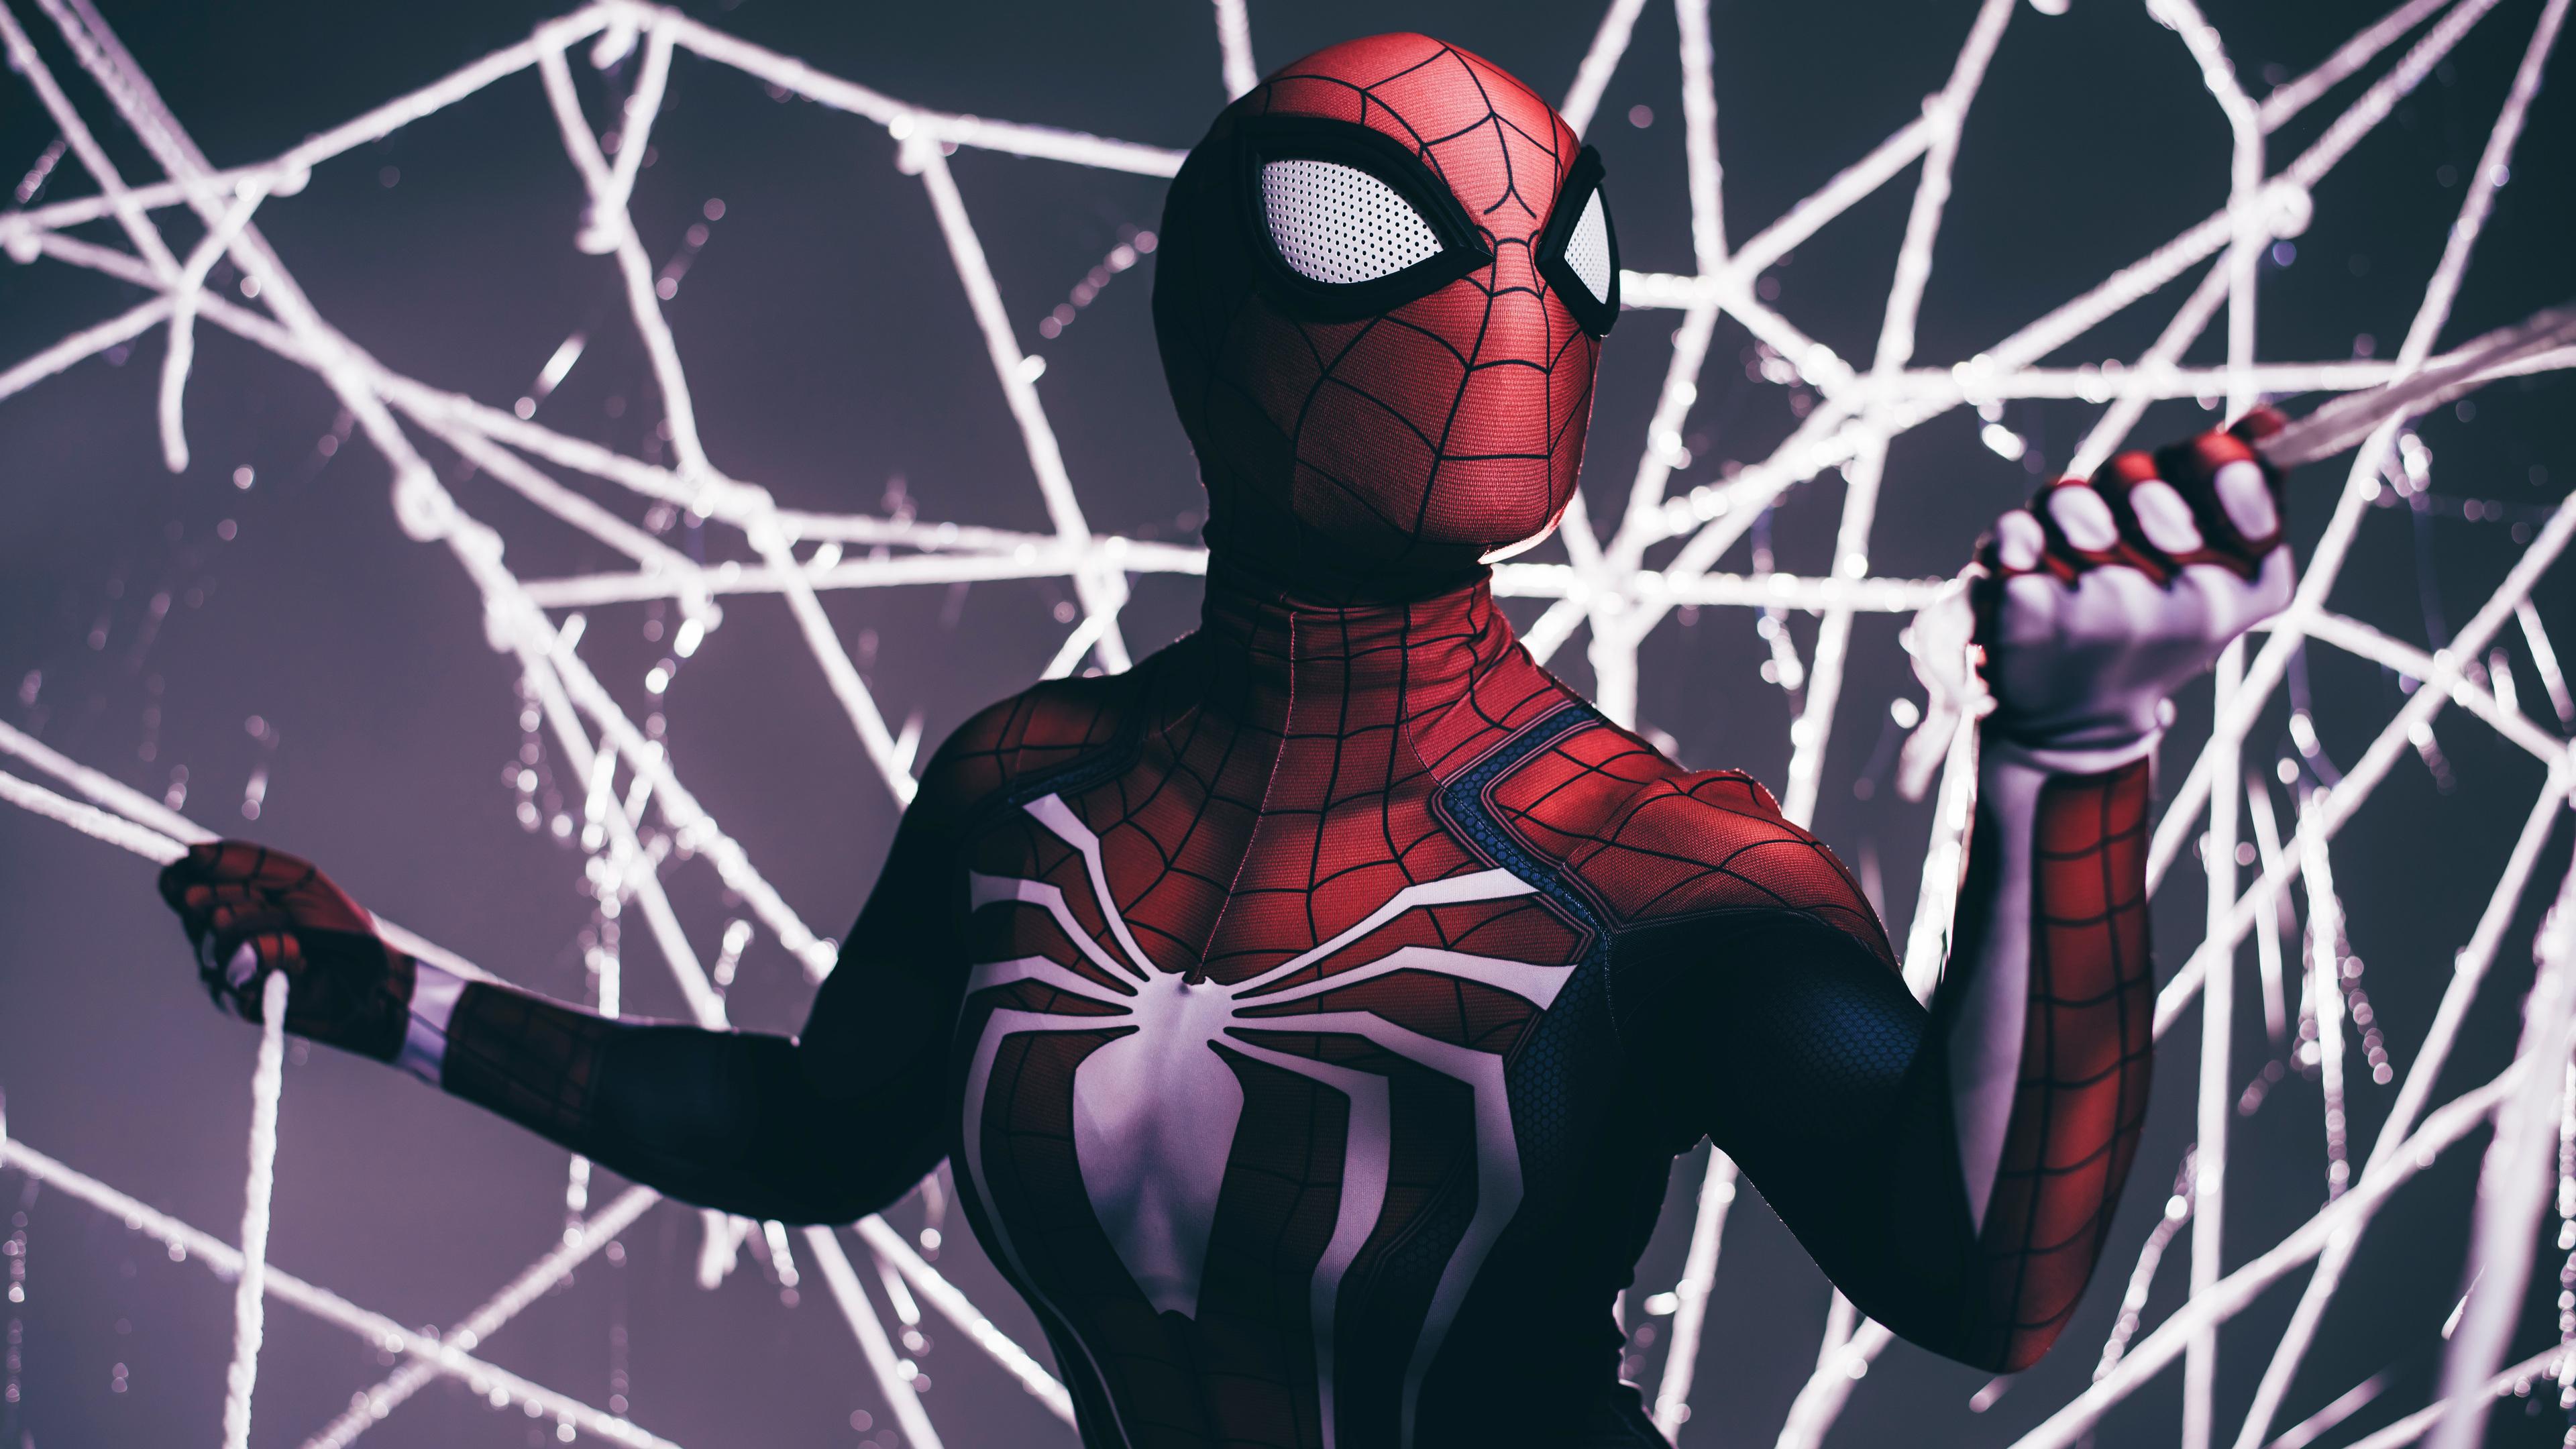 spiderman shooting web 1536523734 - Spiderman Shooting Web - superheroes wallpapers, spiderman wallpapers, hd-wallpapers, flickr wallpapers, cosplay wallpapers, artist wallpapers, 8k wallpapers, 5k wallpapers, 4k-wallpapers